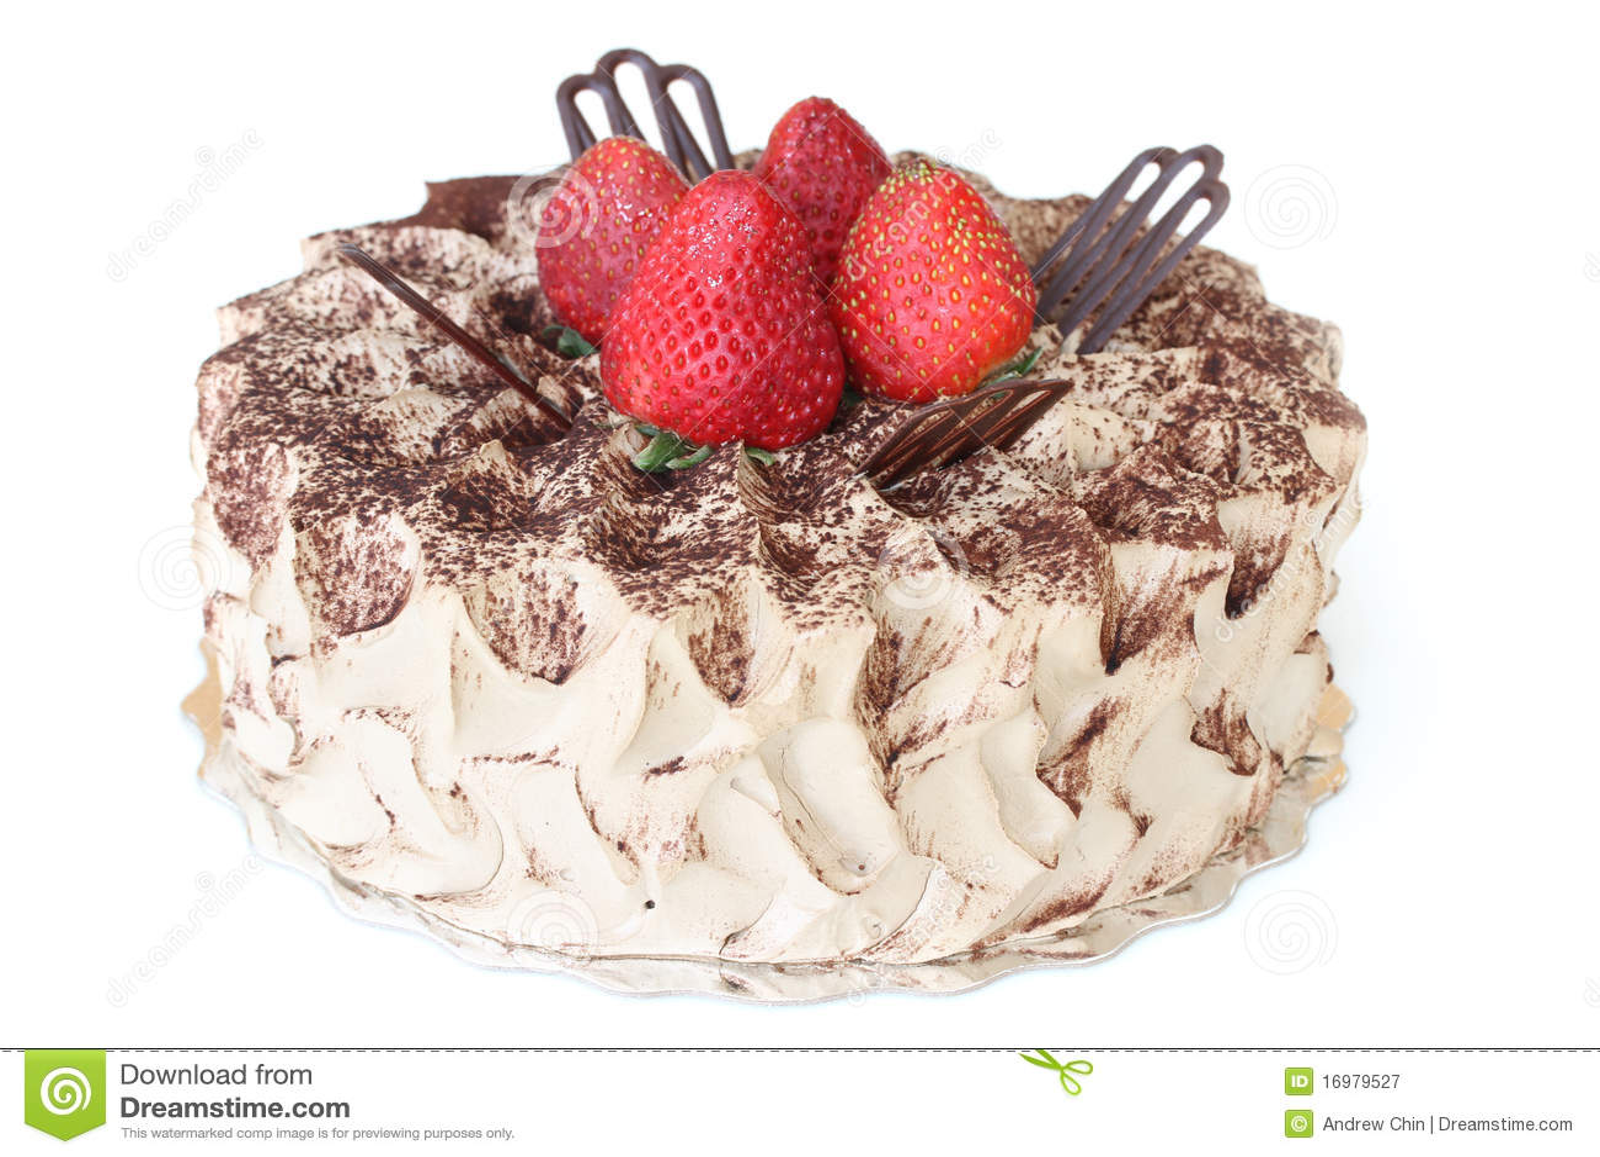 mr: no pr: no 4 810 17 蛋糕 id 16979527 © andrew chin | dr图片